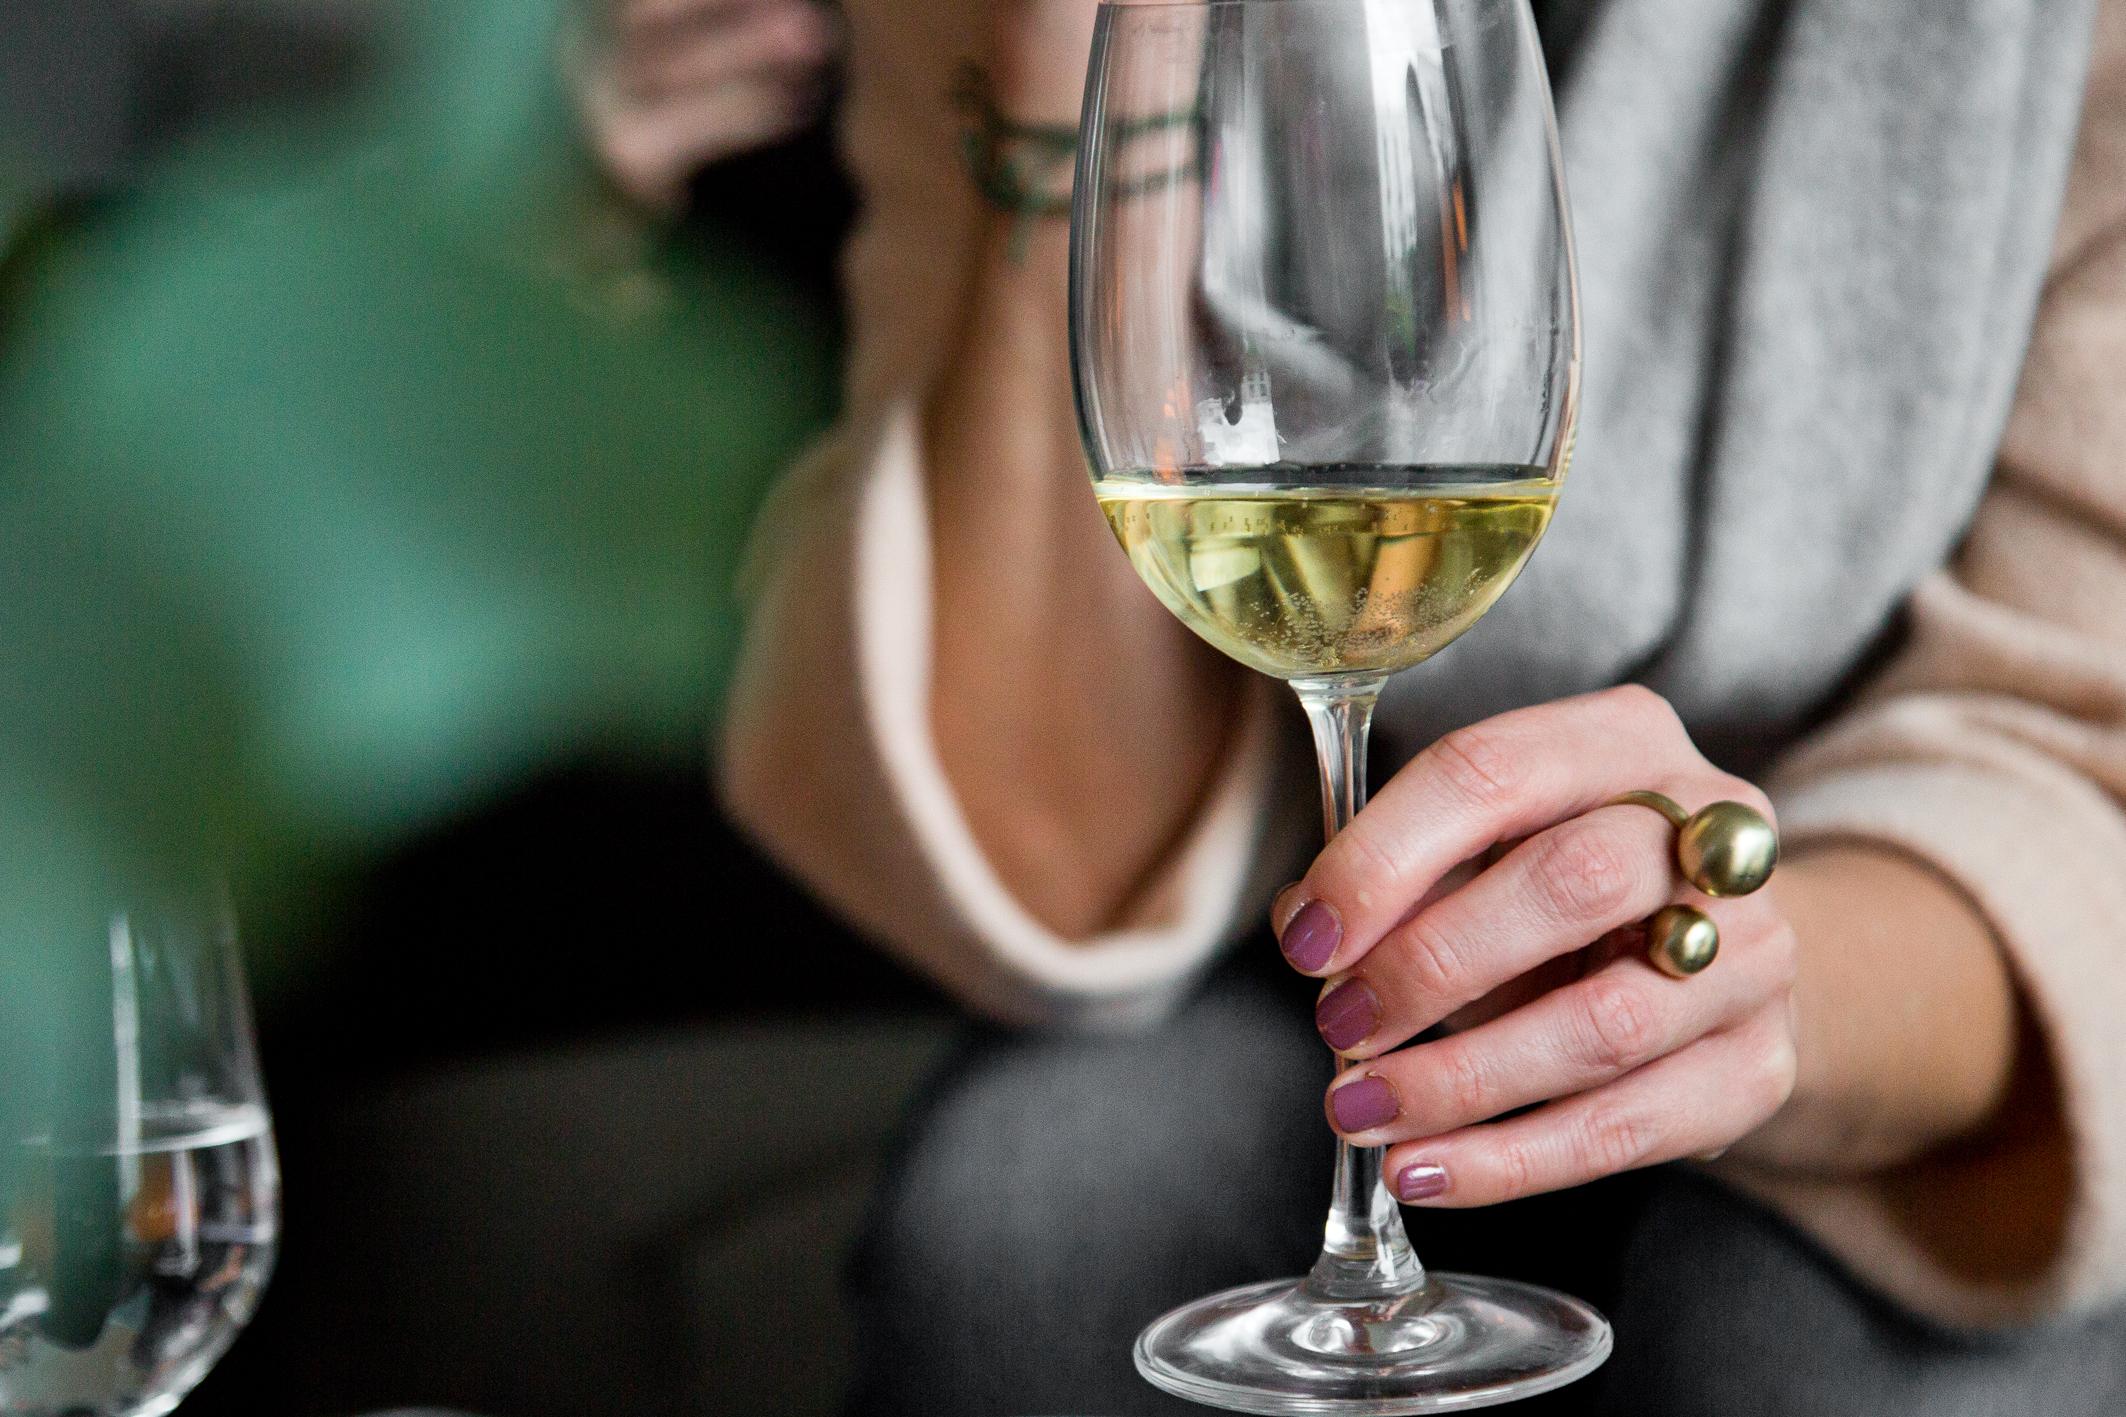 Weinglas in Hand